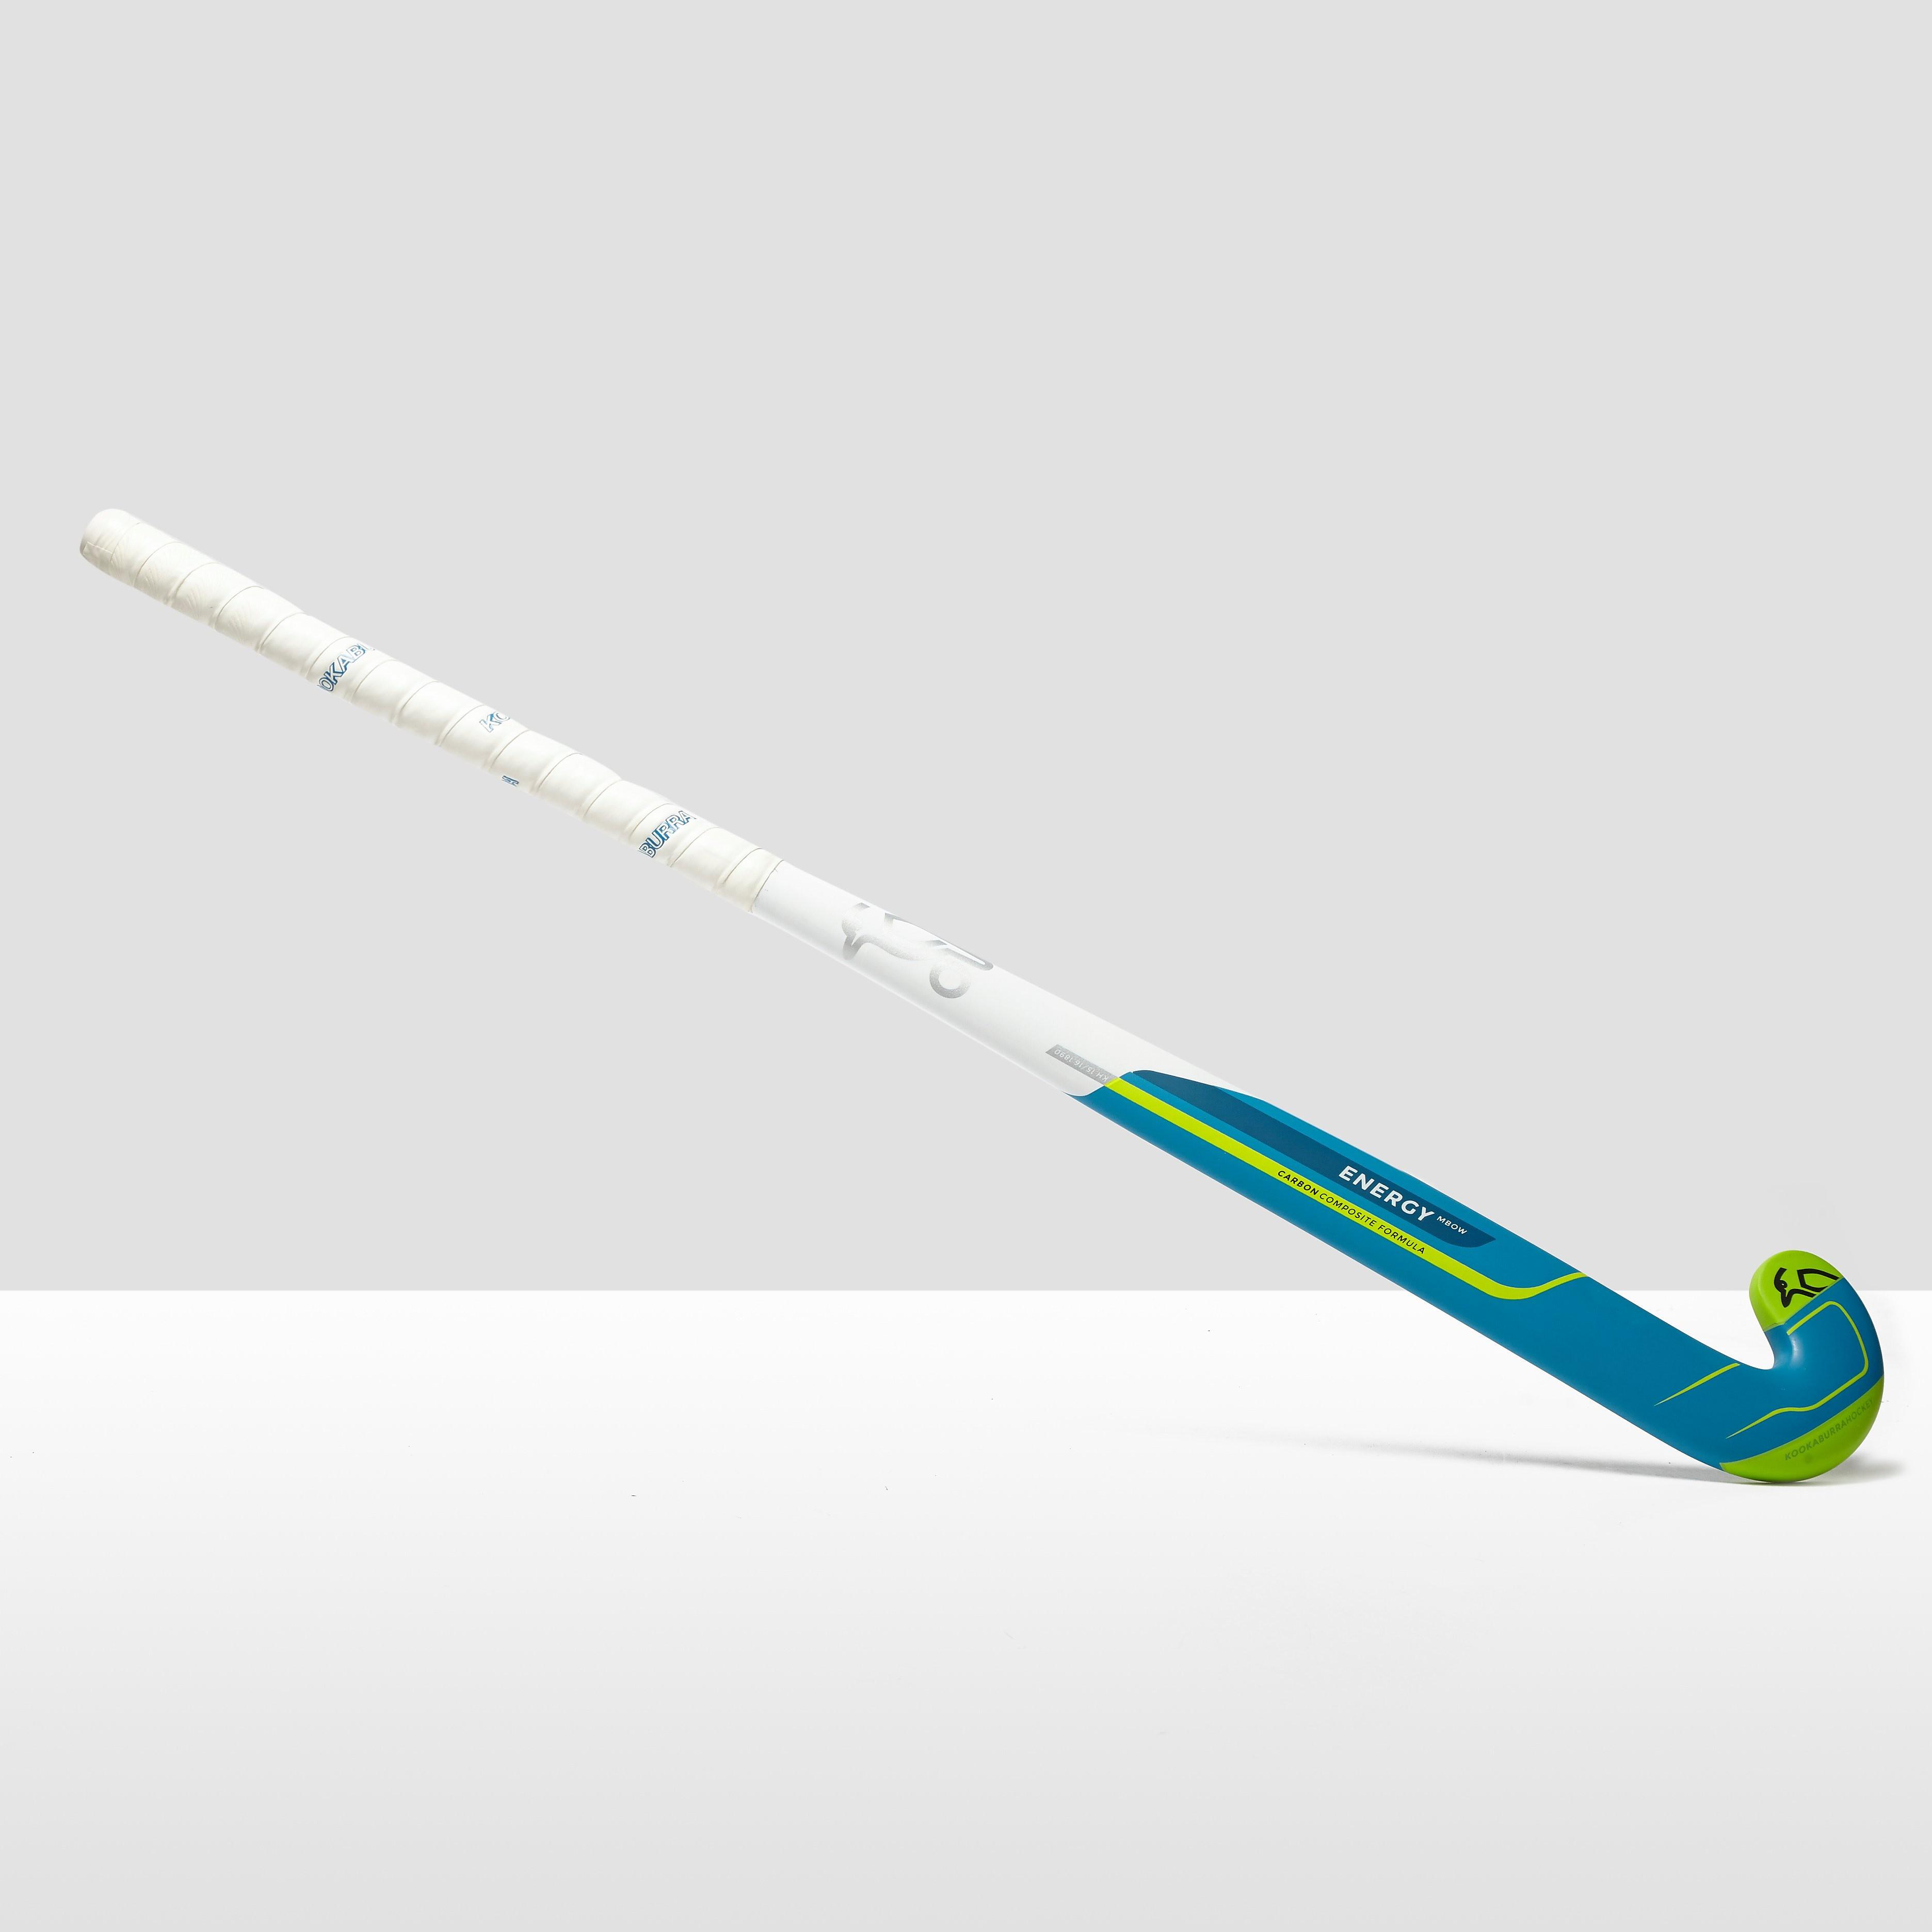 Kookaburra Energy Men's Hockey Stick